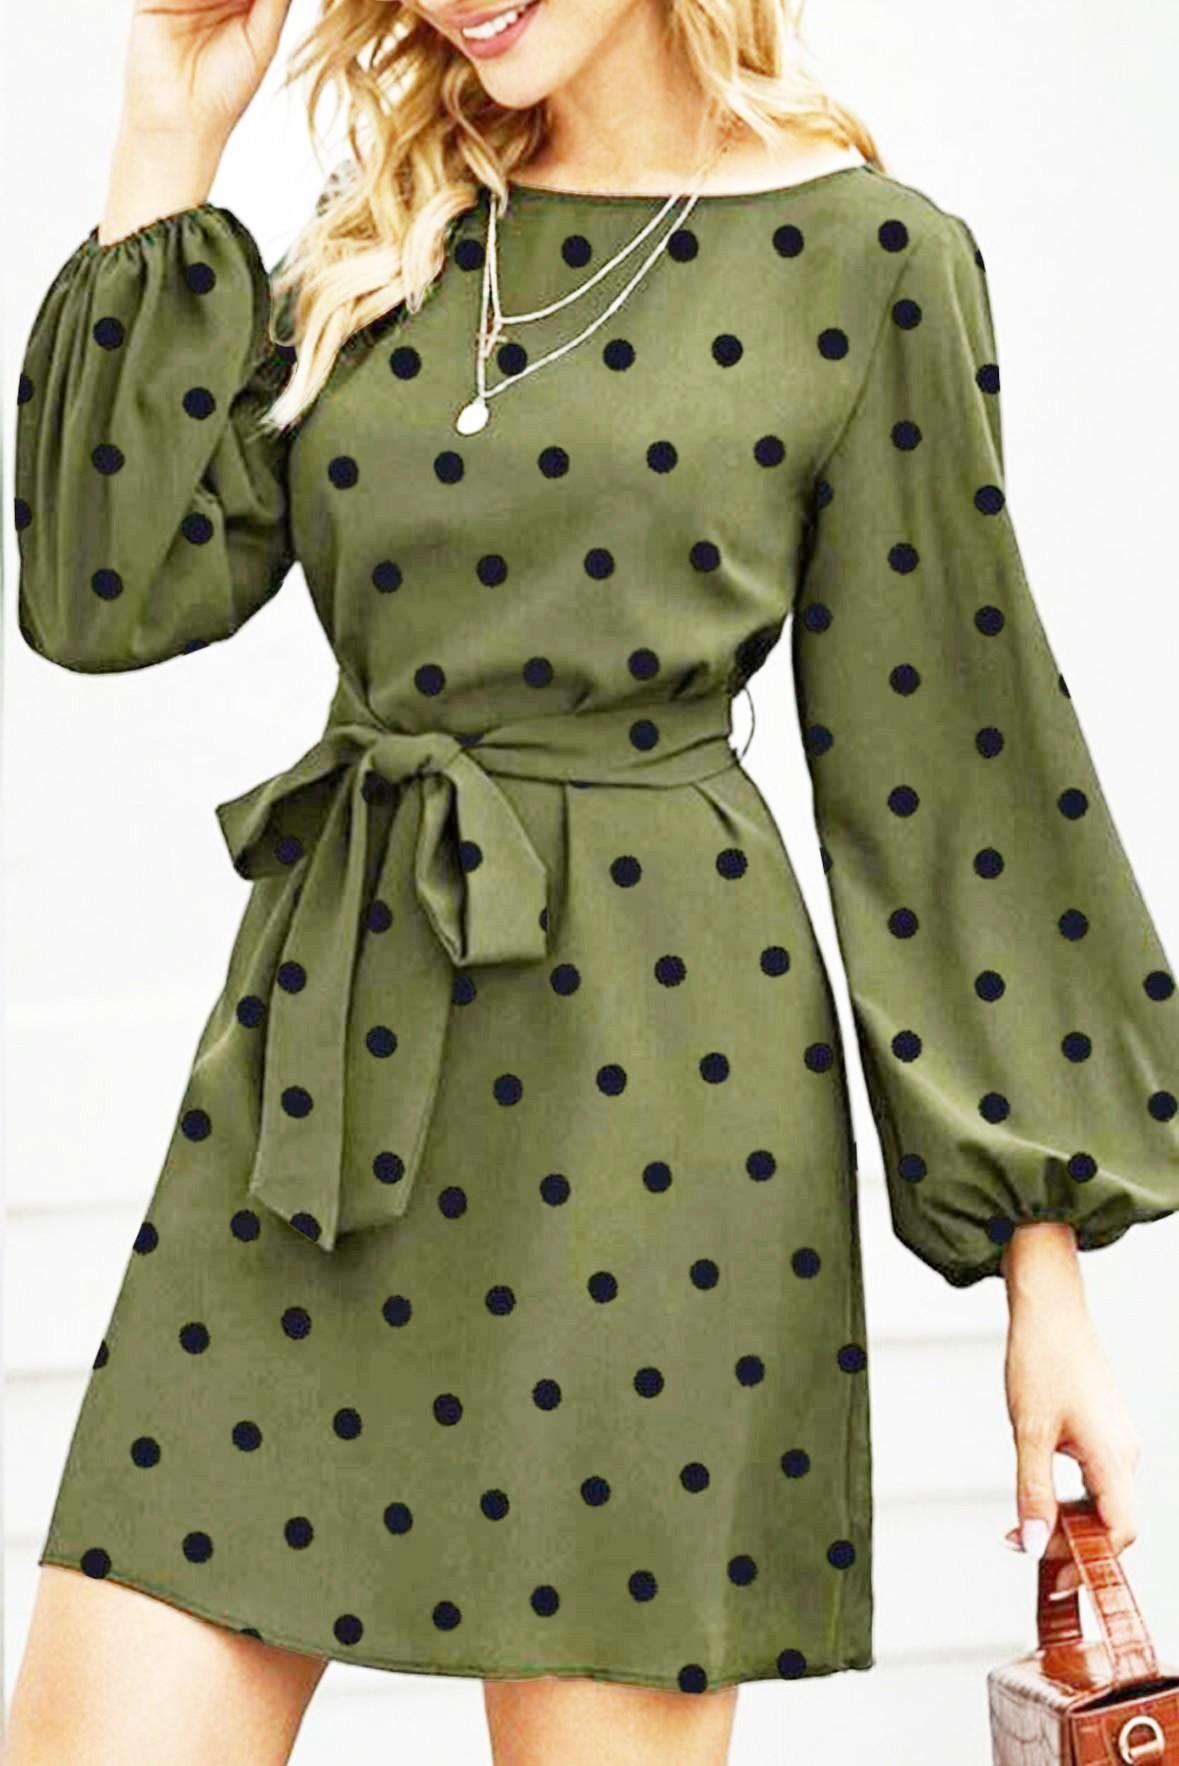 Walking in ibiza polka dot dress